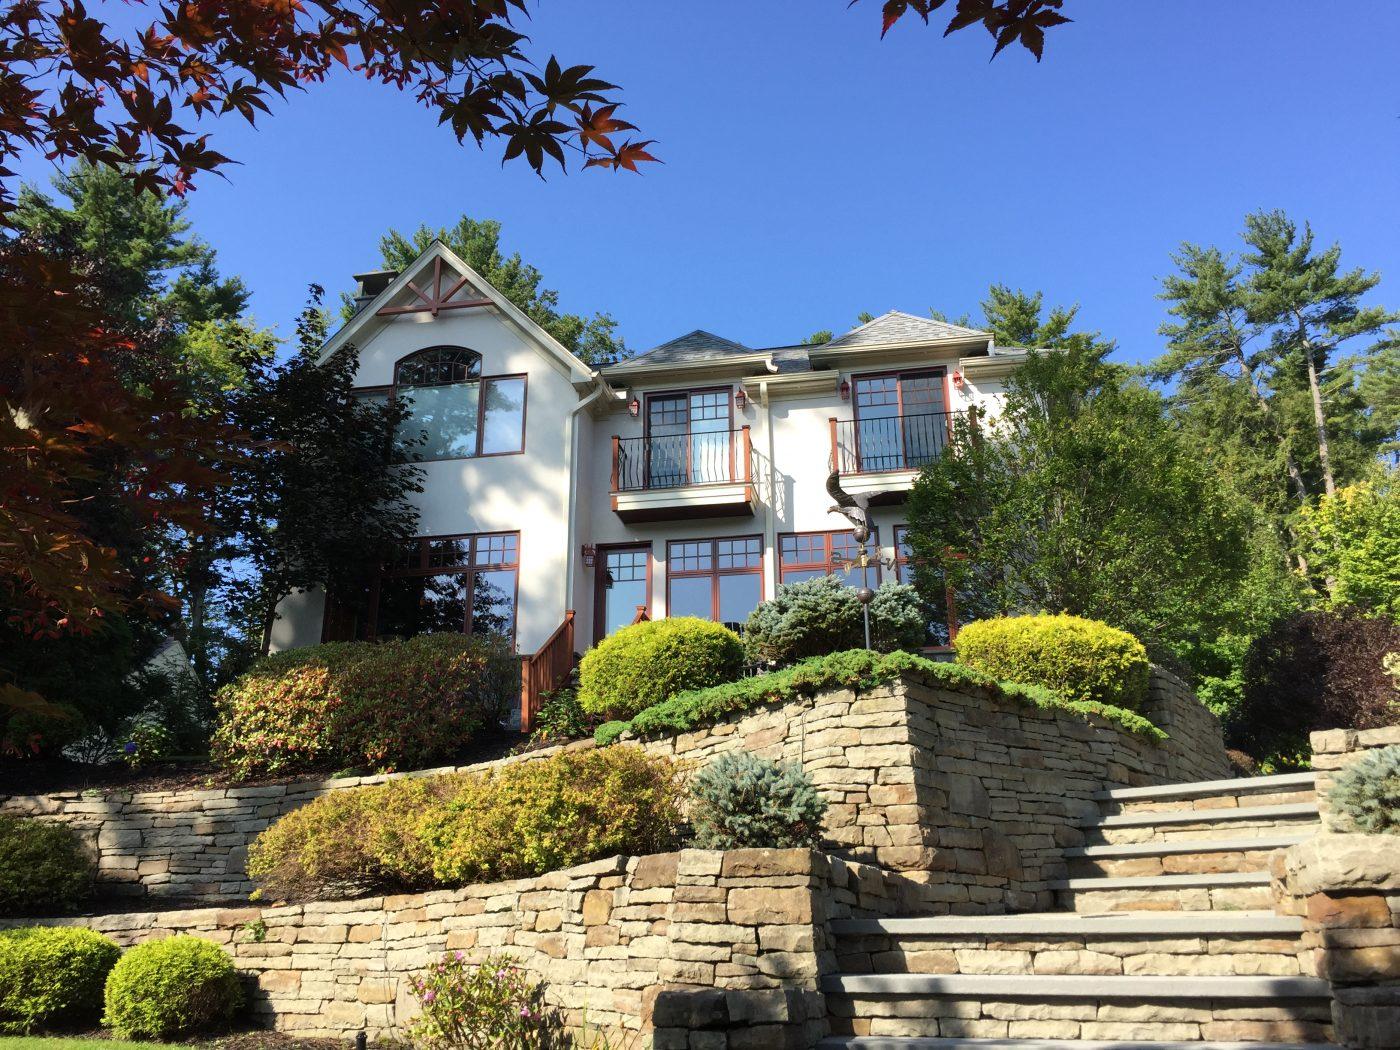 Lake George Vacation Rental Dunham S C Property Listing